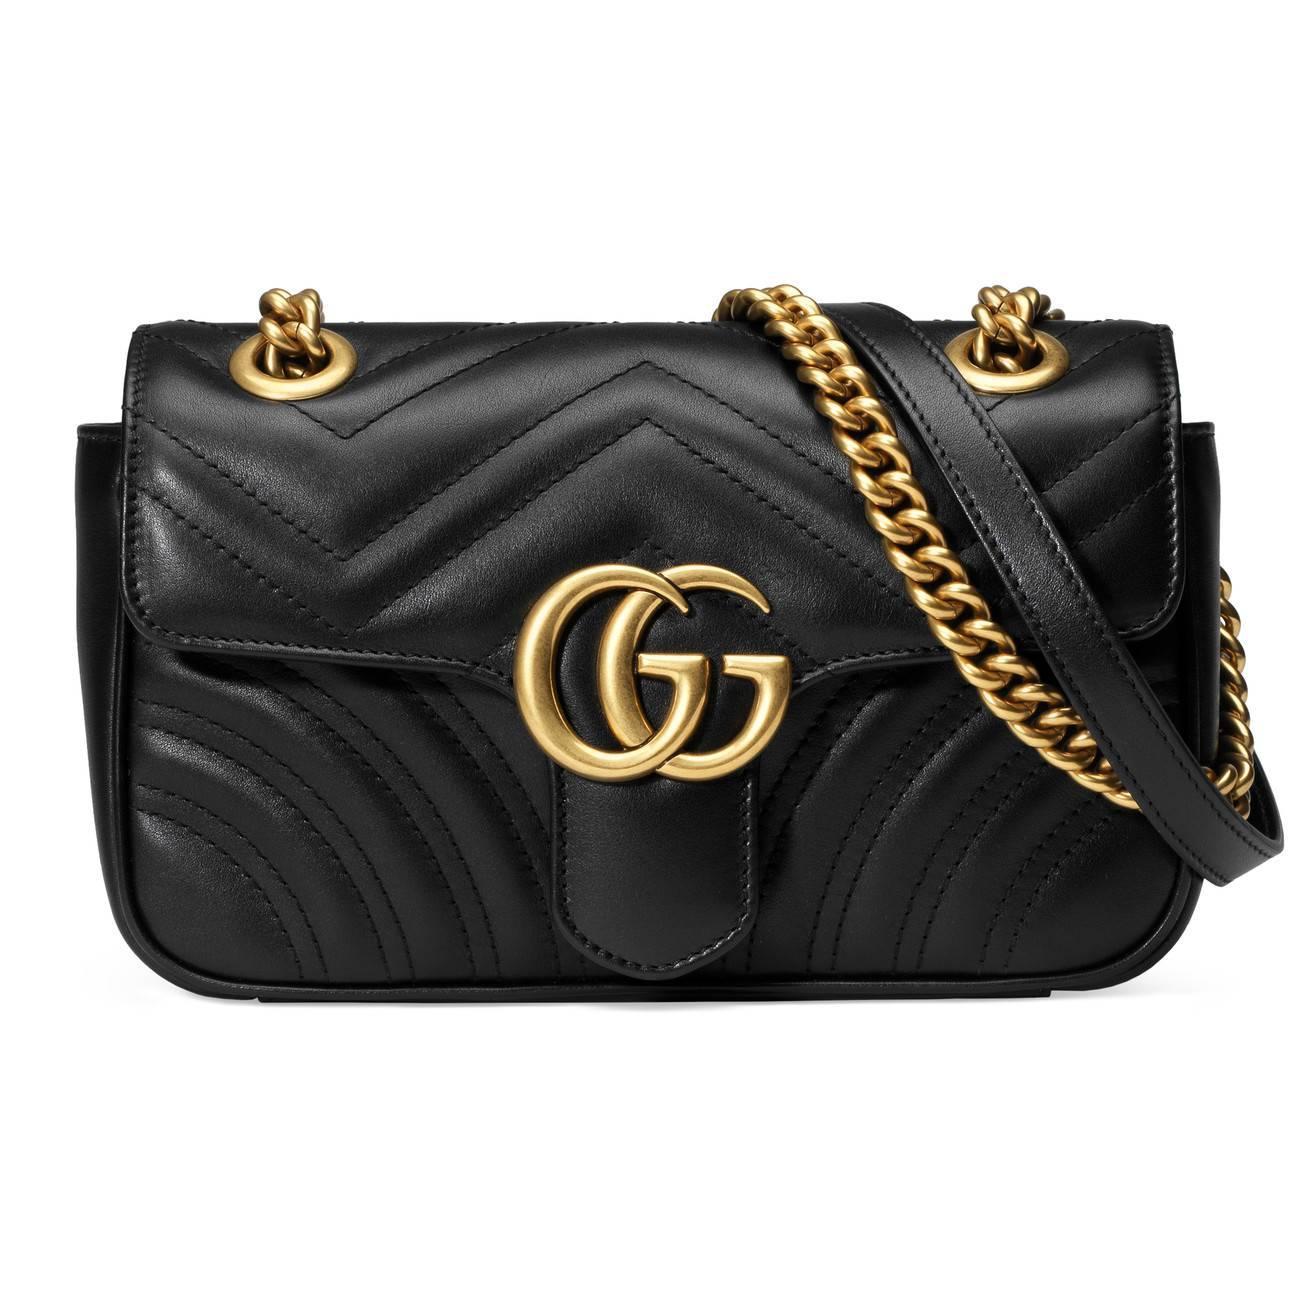 b513916a513b Gucci Gg Marmont Matelassã© Mini Bag in Black - Save 36% - Lyst